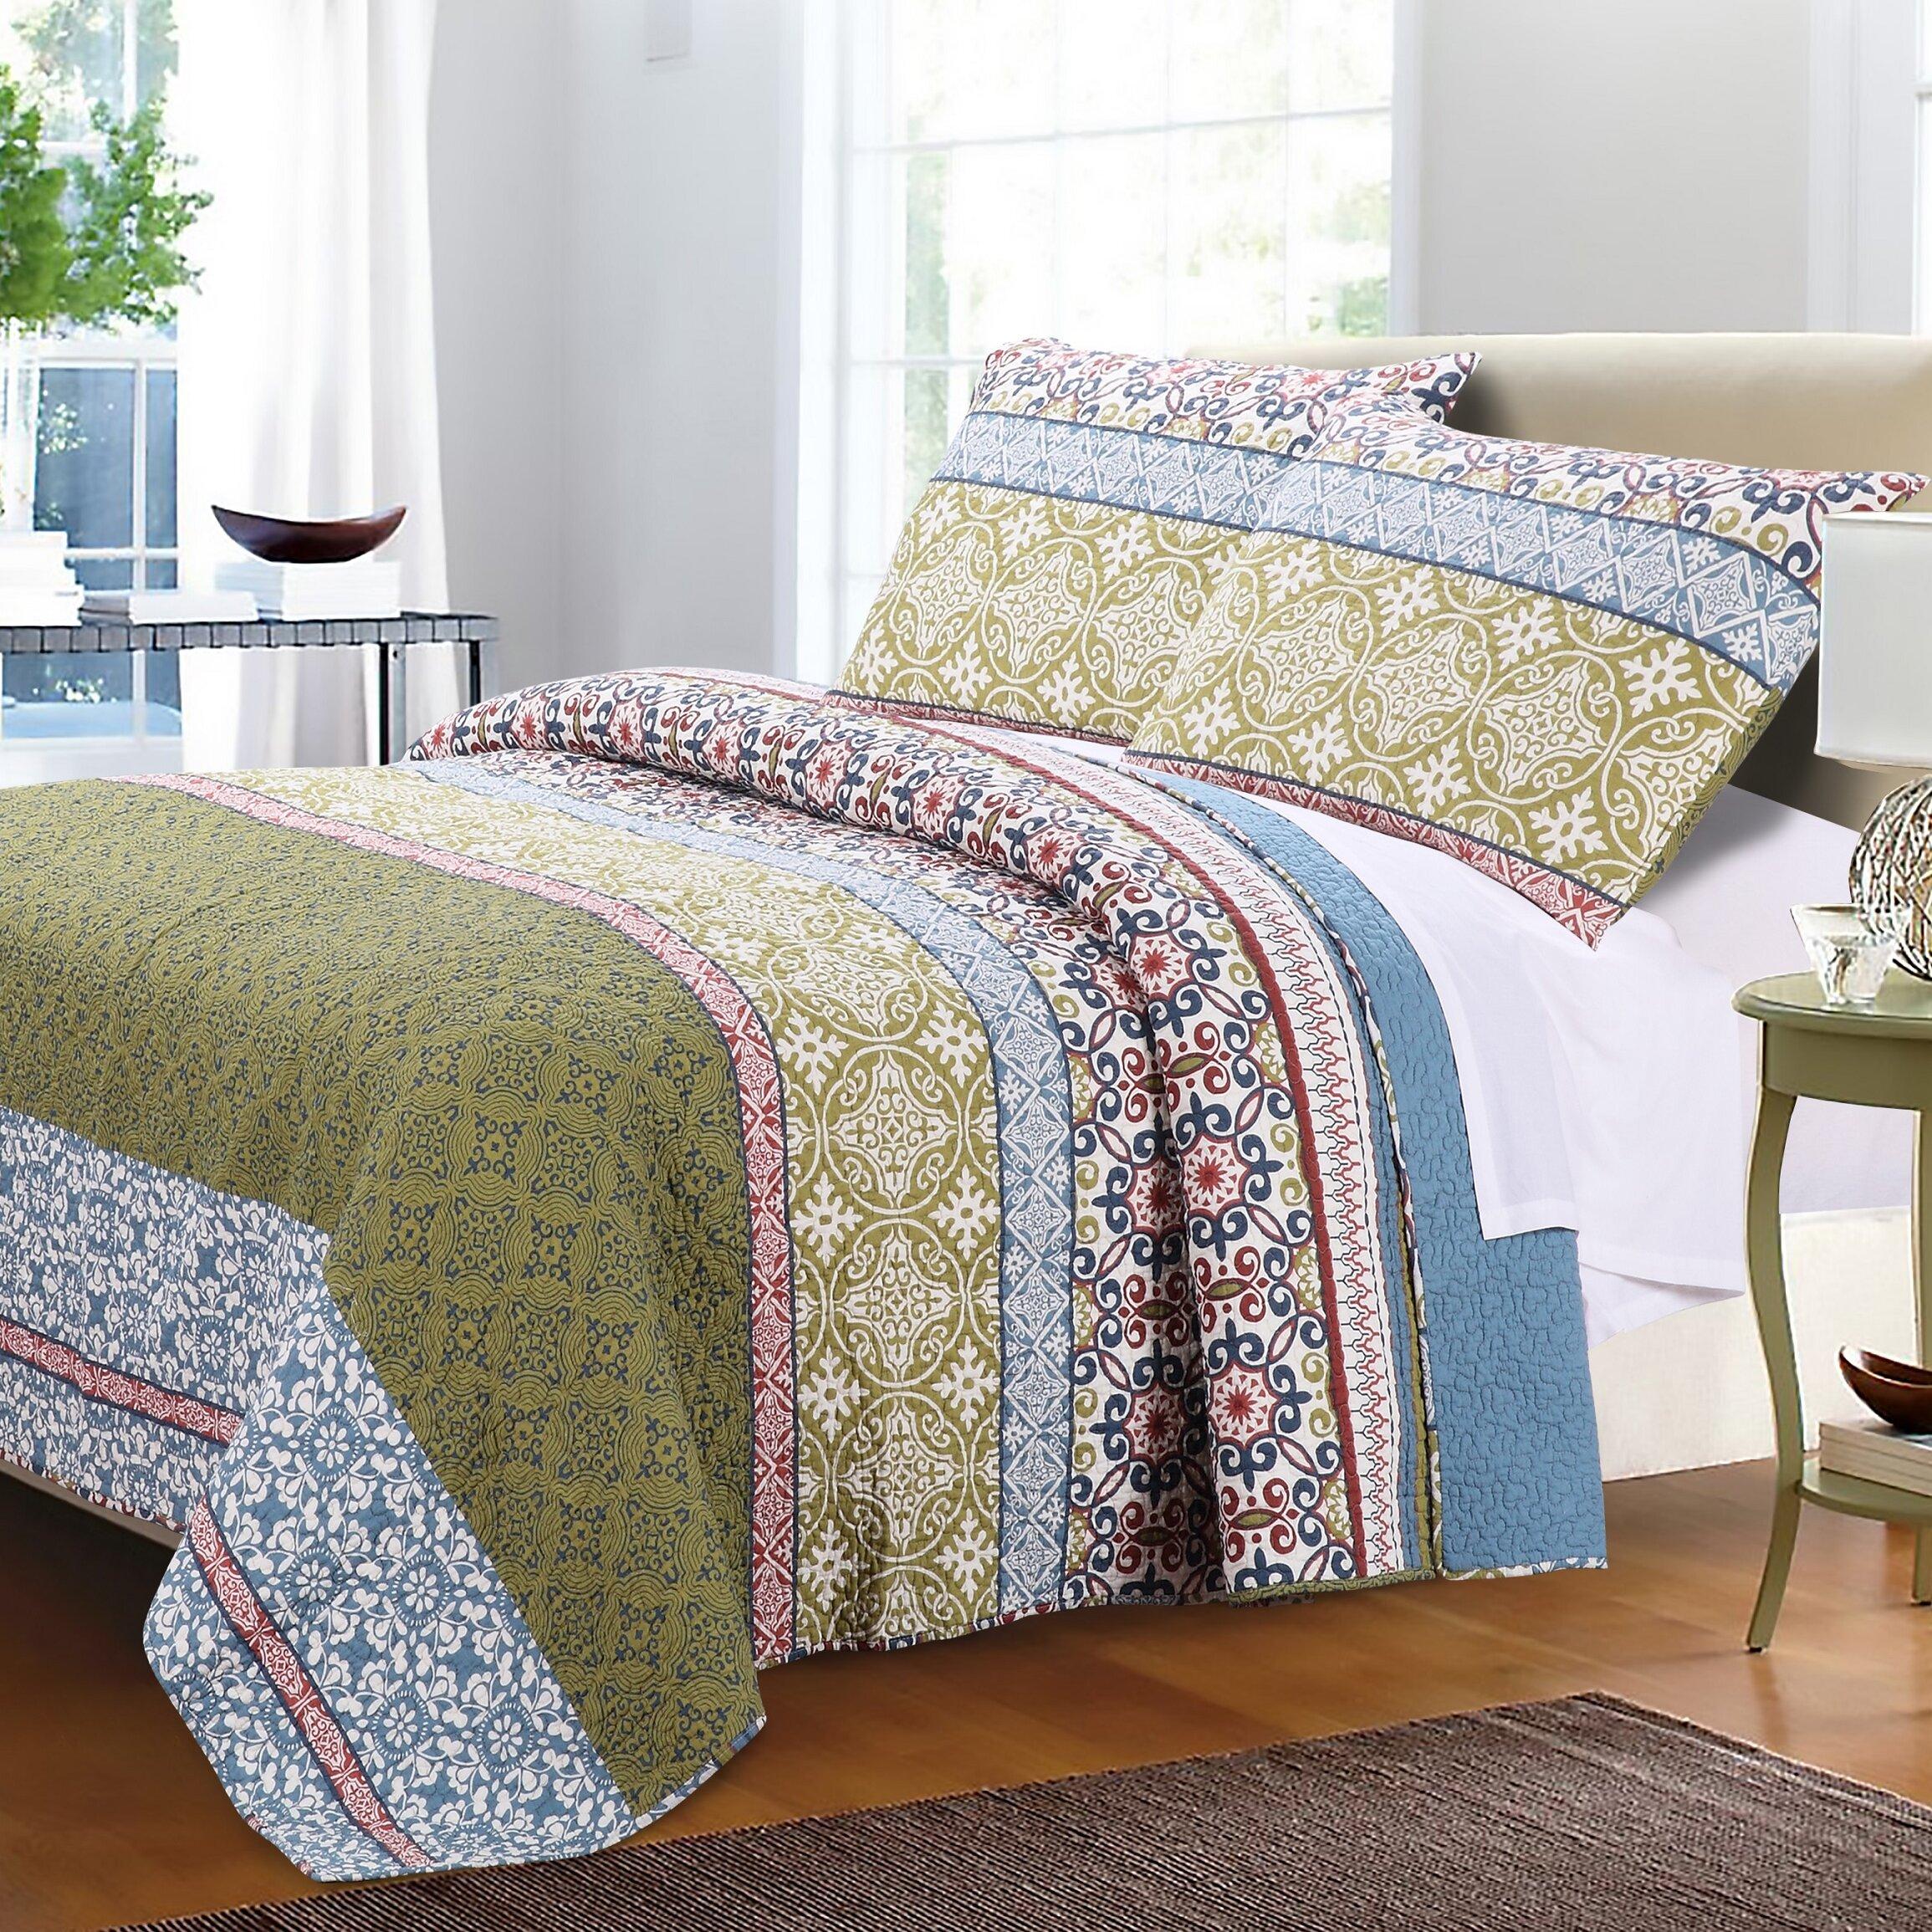 set shangri greenland by ip com fashions walmart beea home la quilt